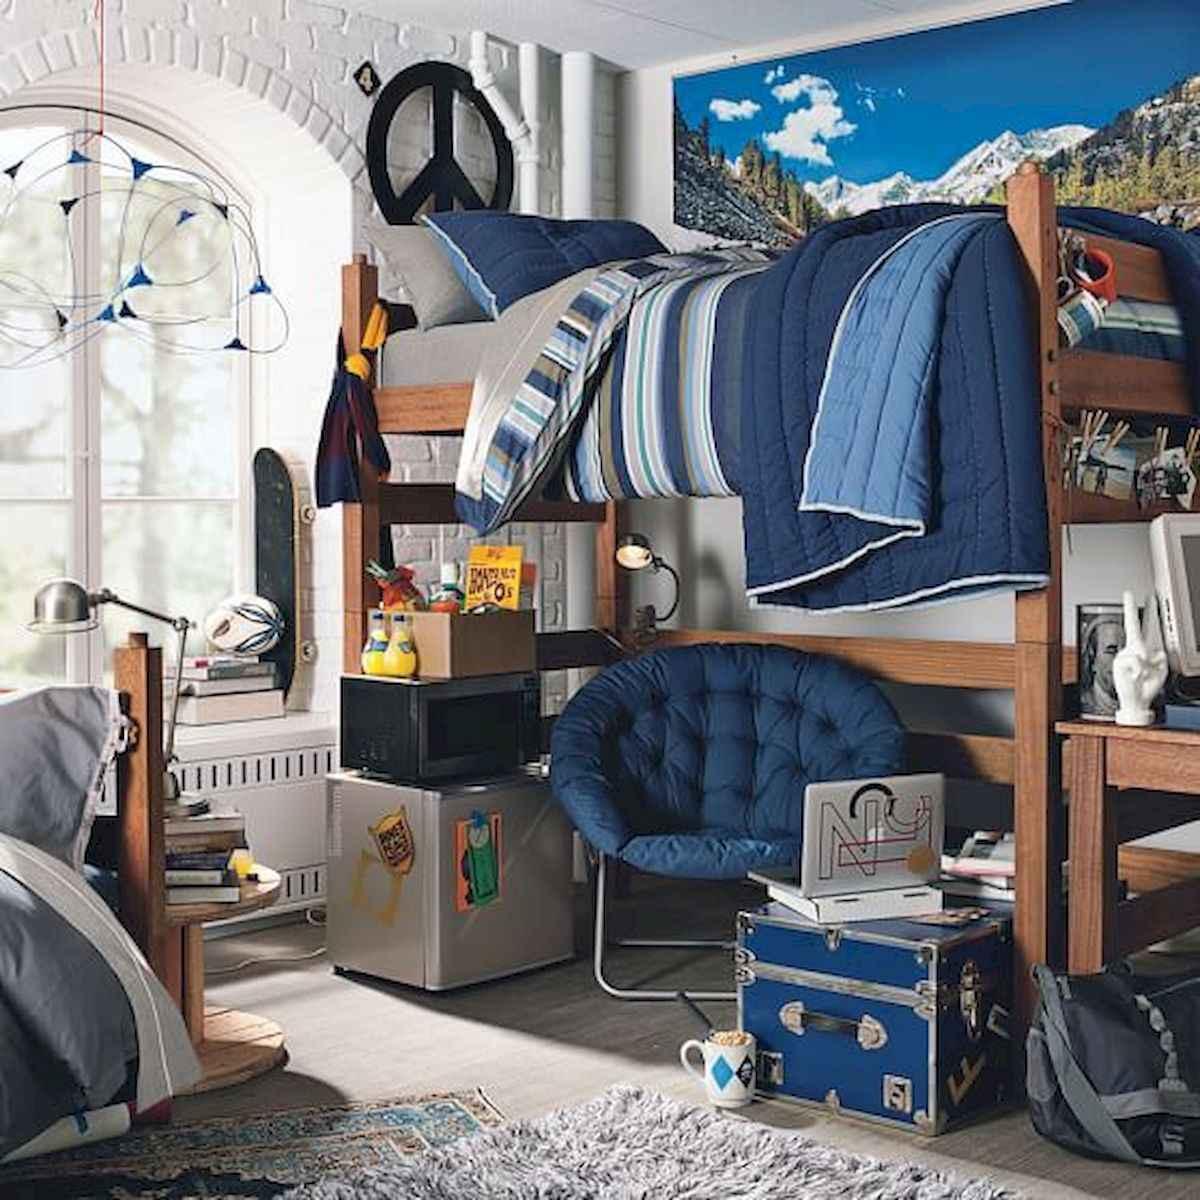 80 Fantastic Small Apartment Bedroom College Design Ideas and Decor (34)